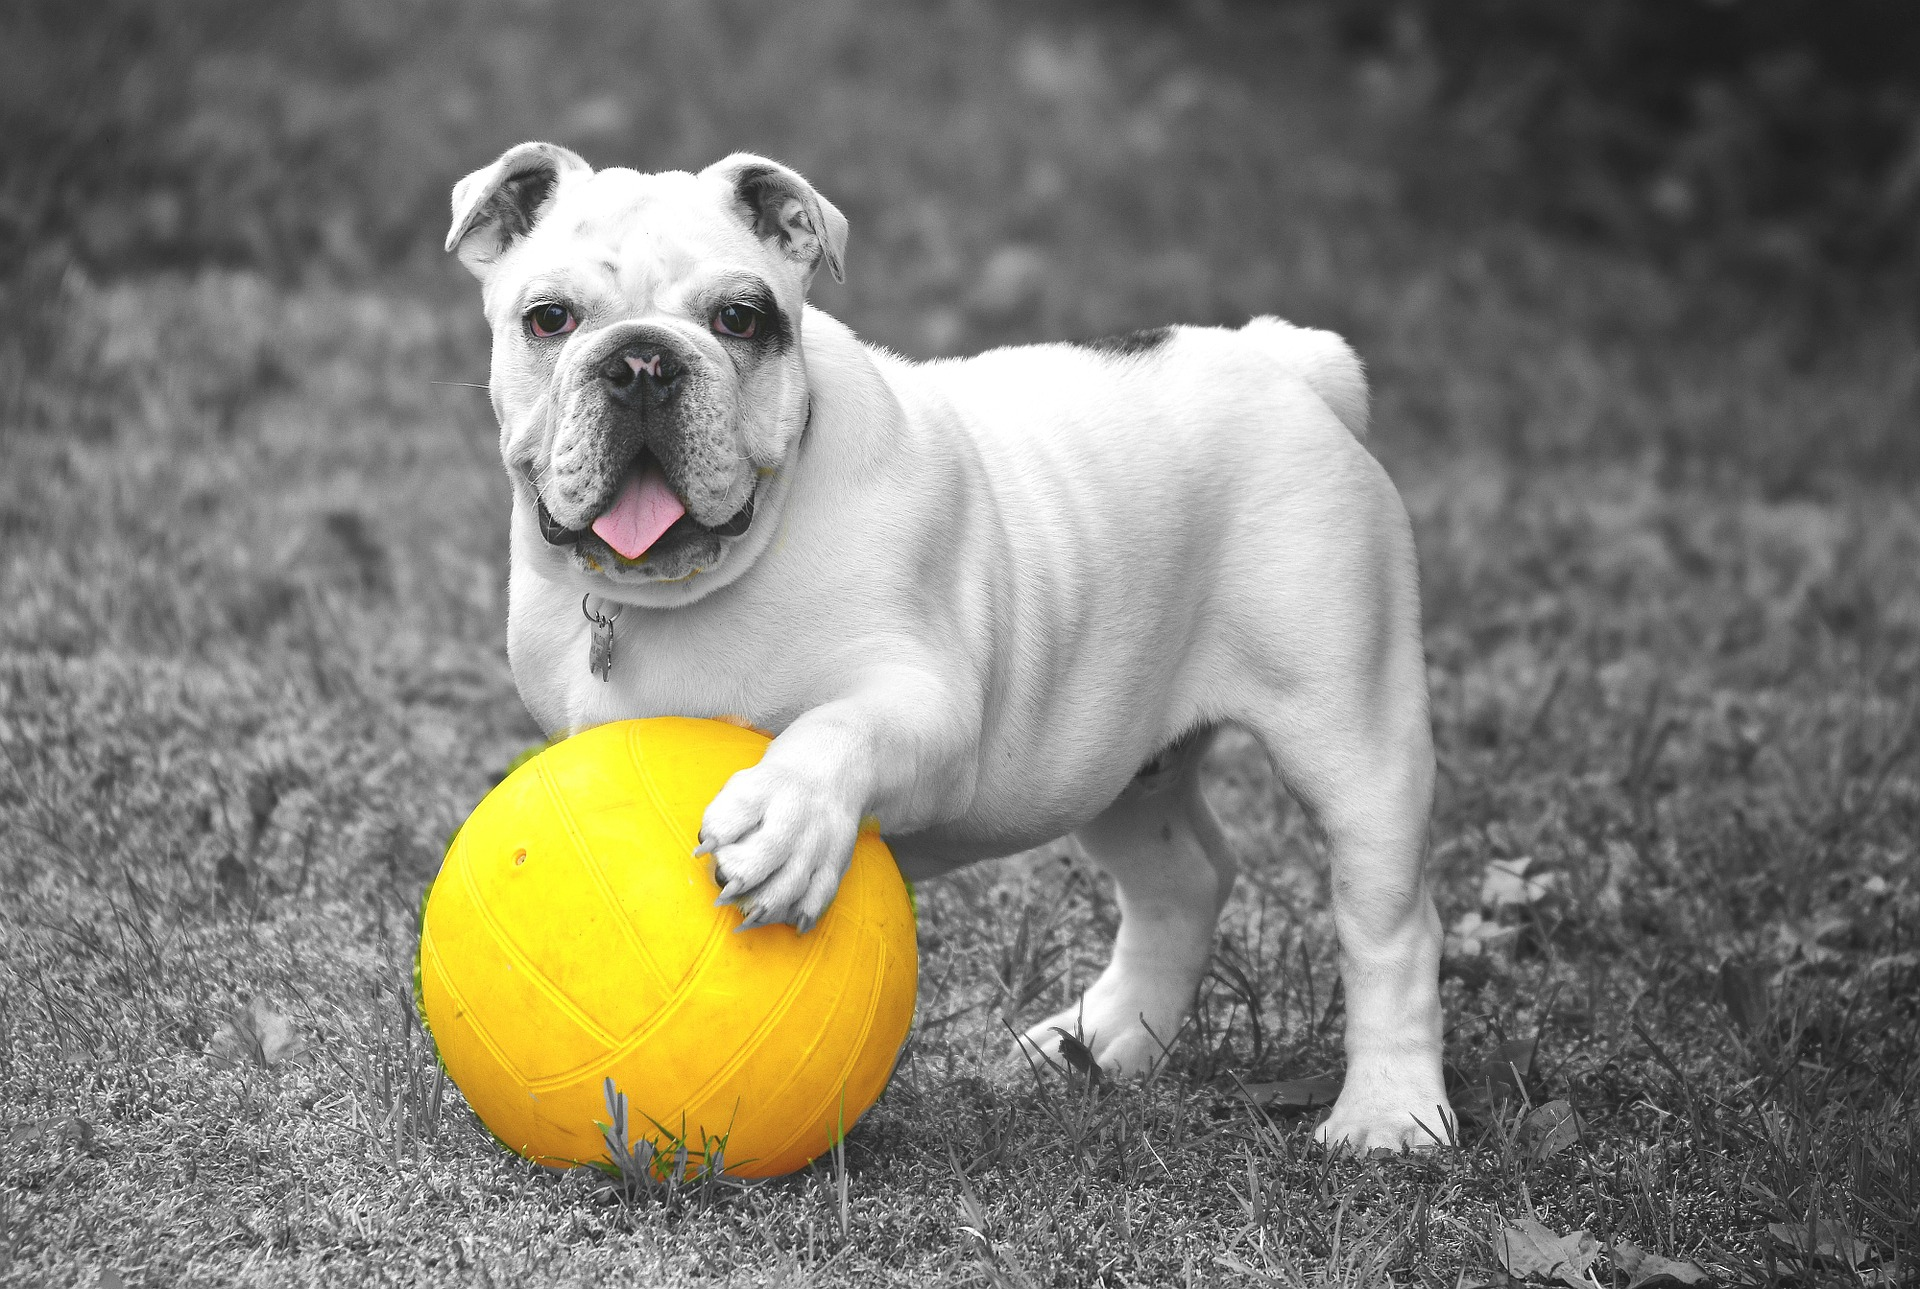 La importancia de jugar con tu mascota